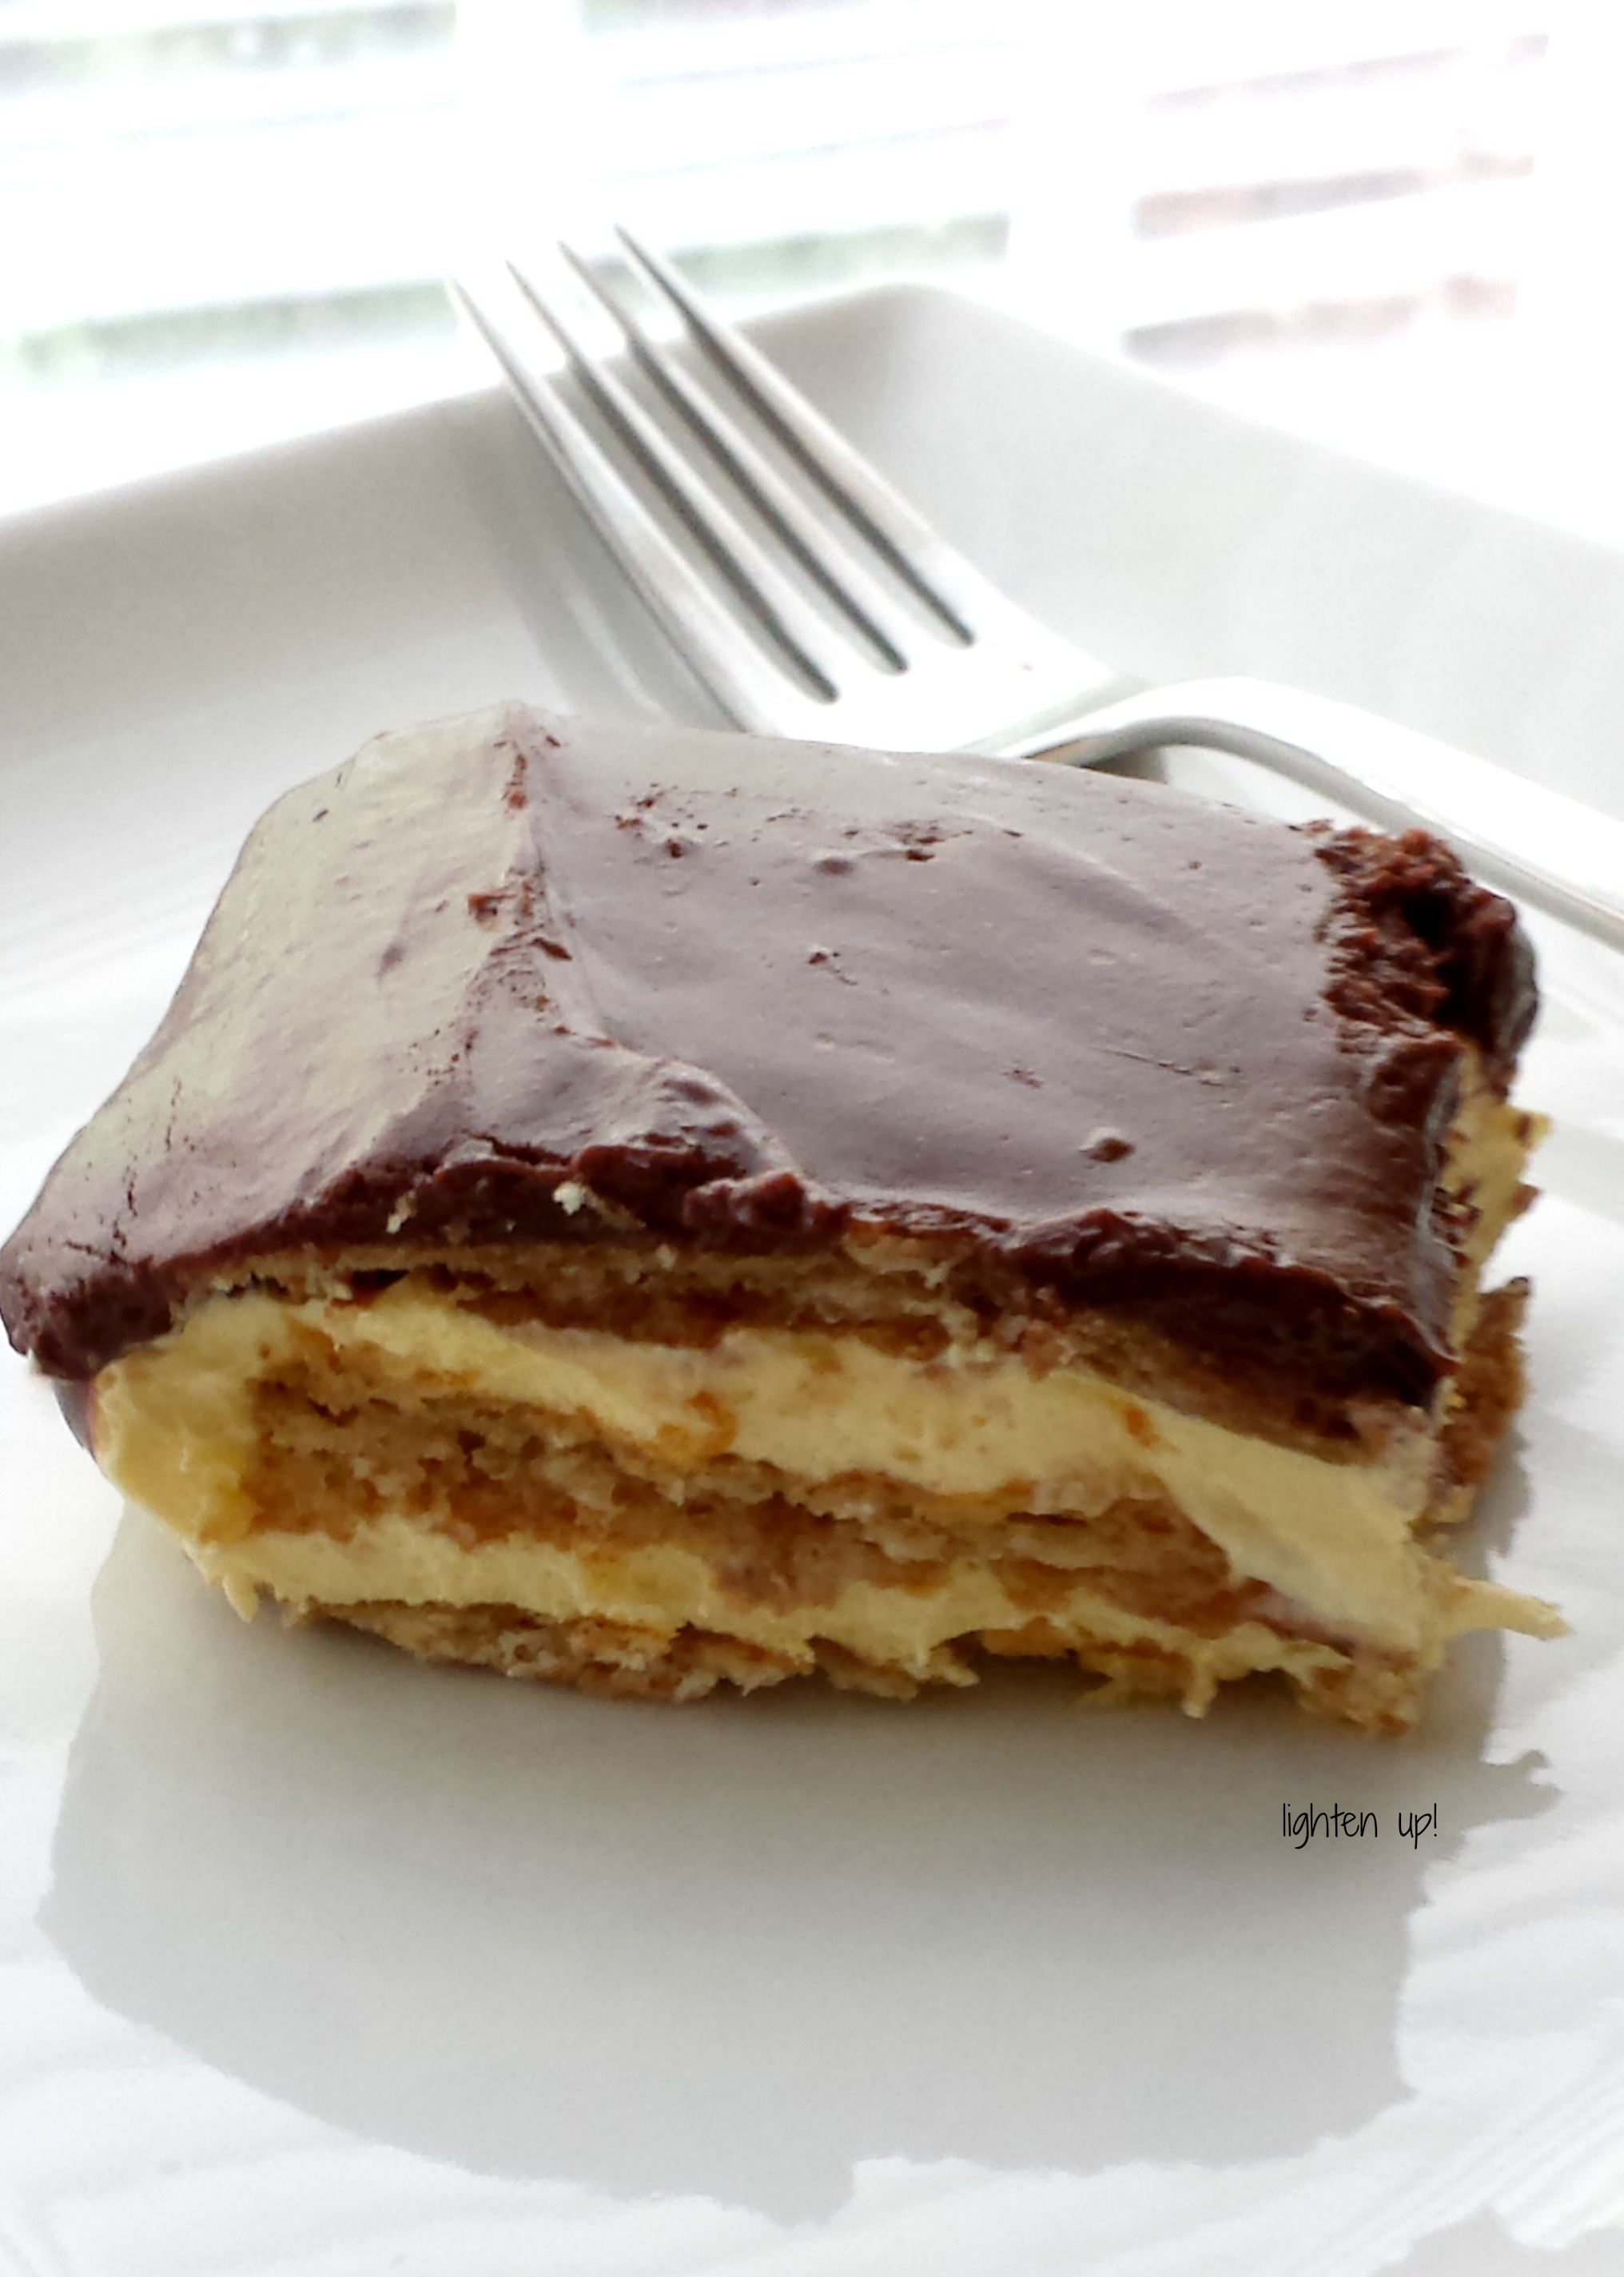 Lightened-up no-bake chocolate eclair cake | Lighten Up!